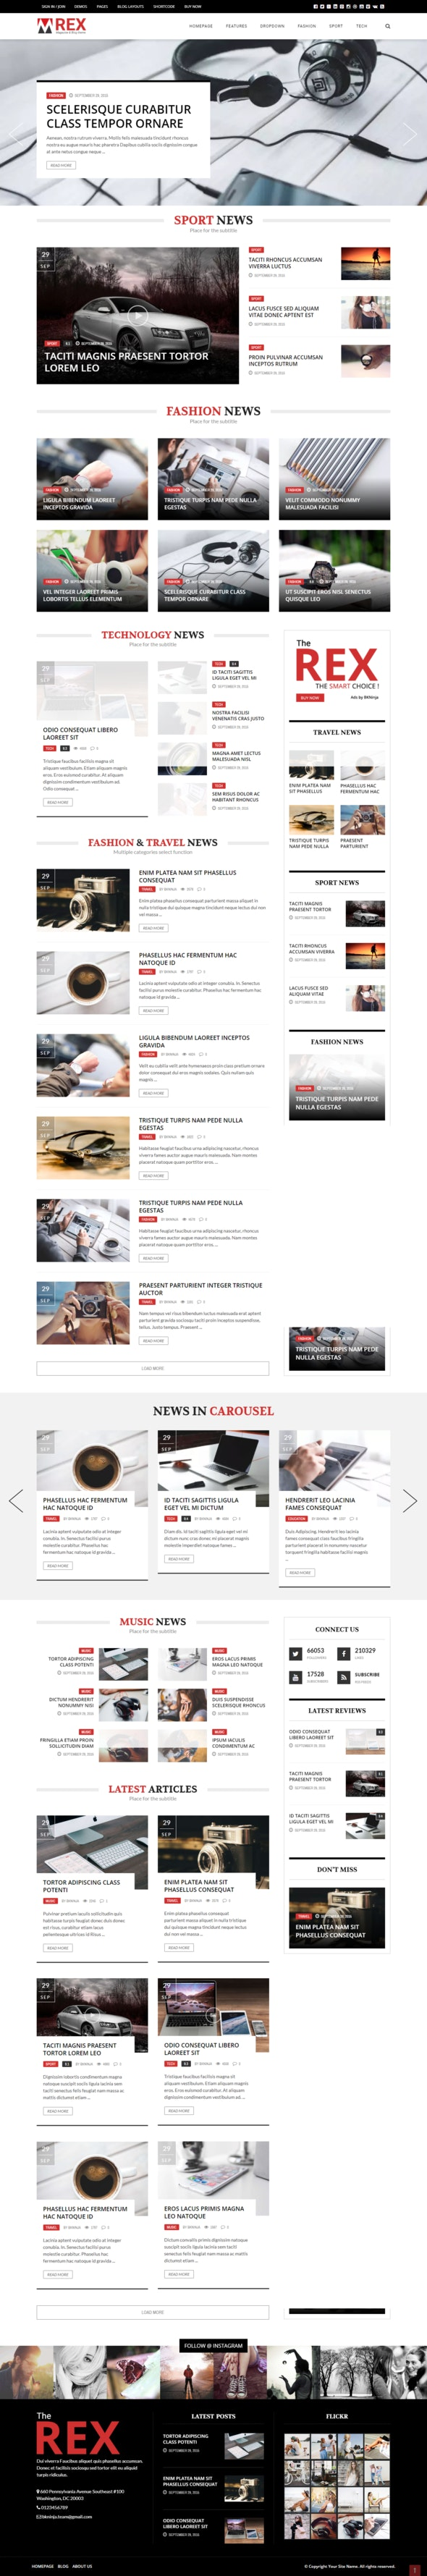 The REX - Drupal 8 Magazine and Blog Theme - Blog / Magazine Drupal